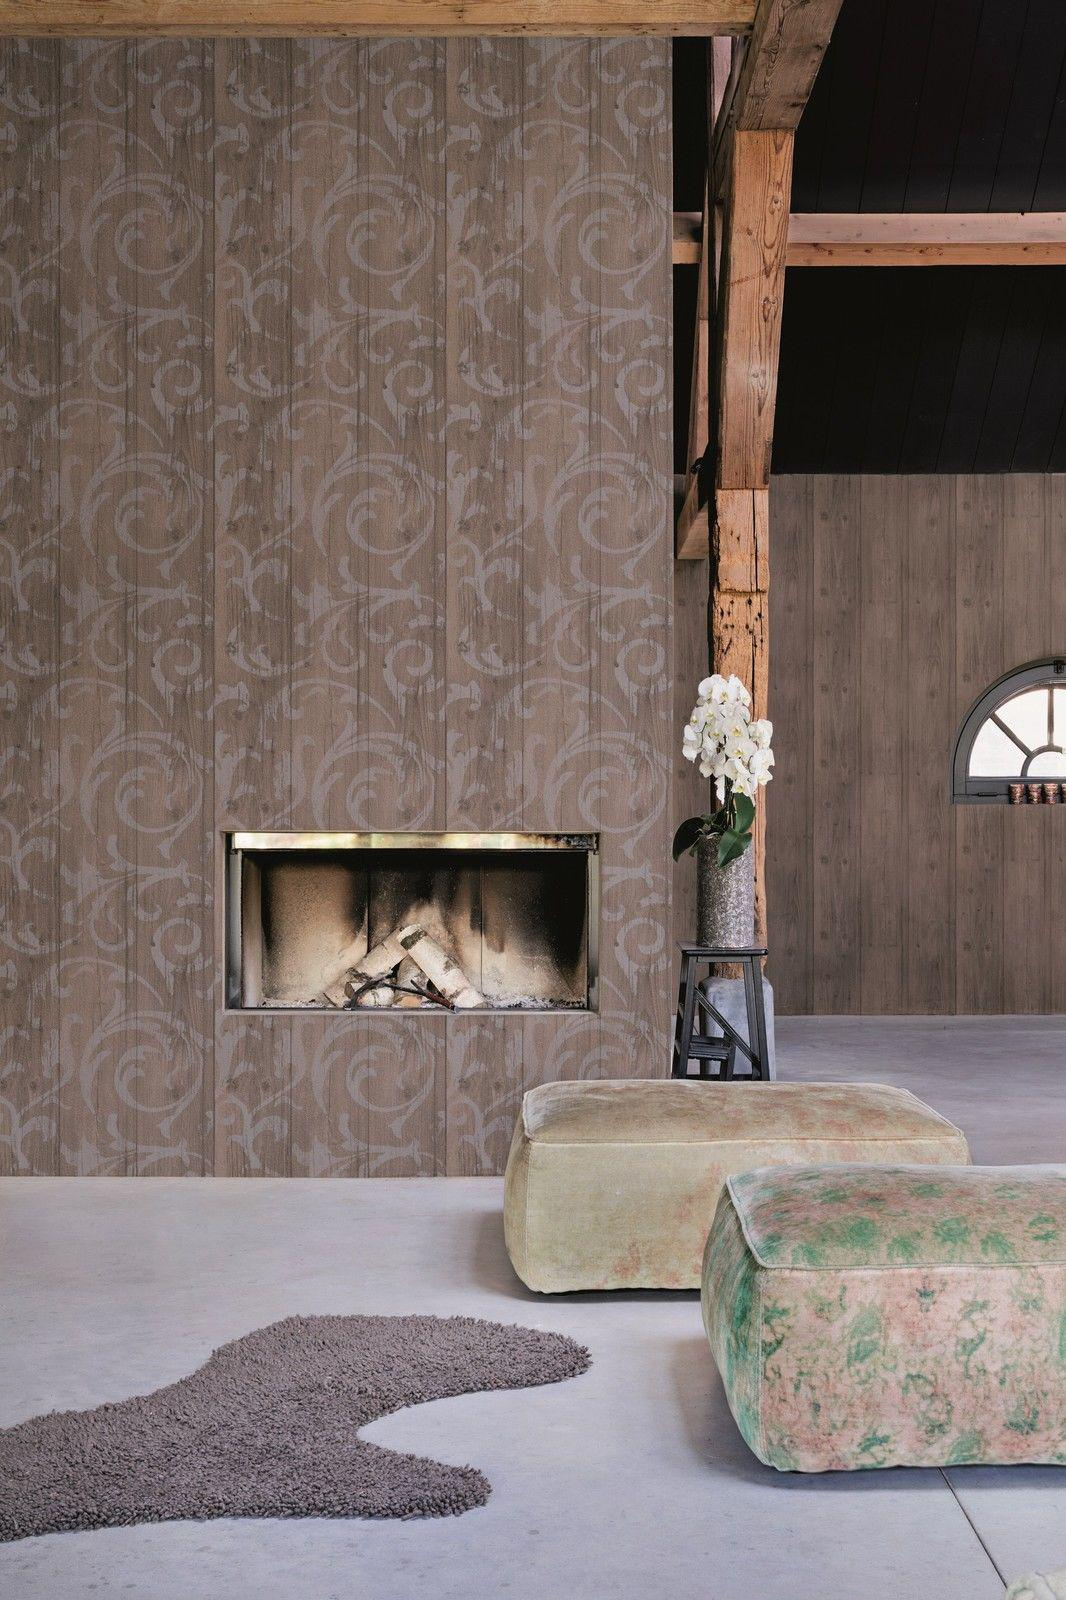 vlies tapete antik holz rustikal ornament muster barock grau beige braun grau kaufen bei. Black Bedroom Furniture Sets. Home Design Ideas